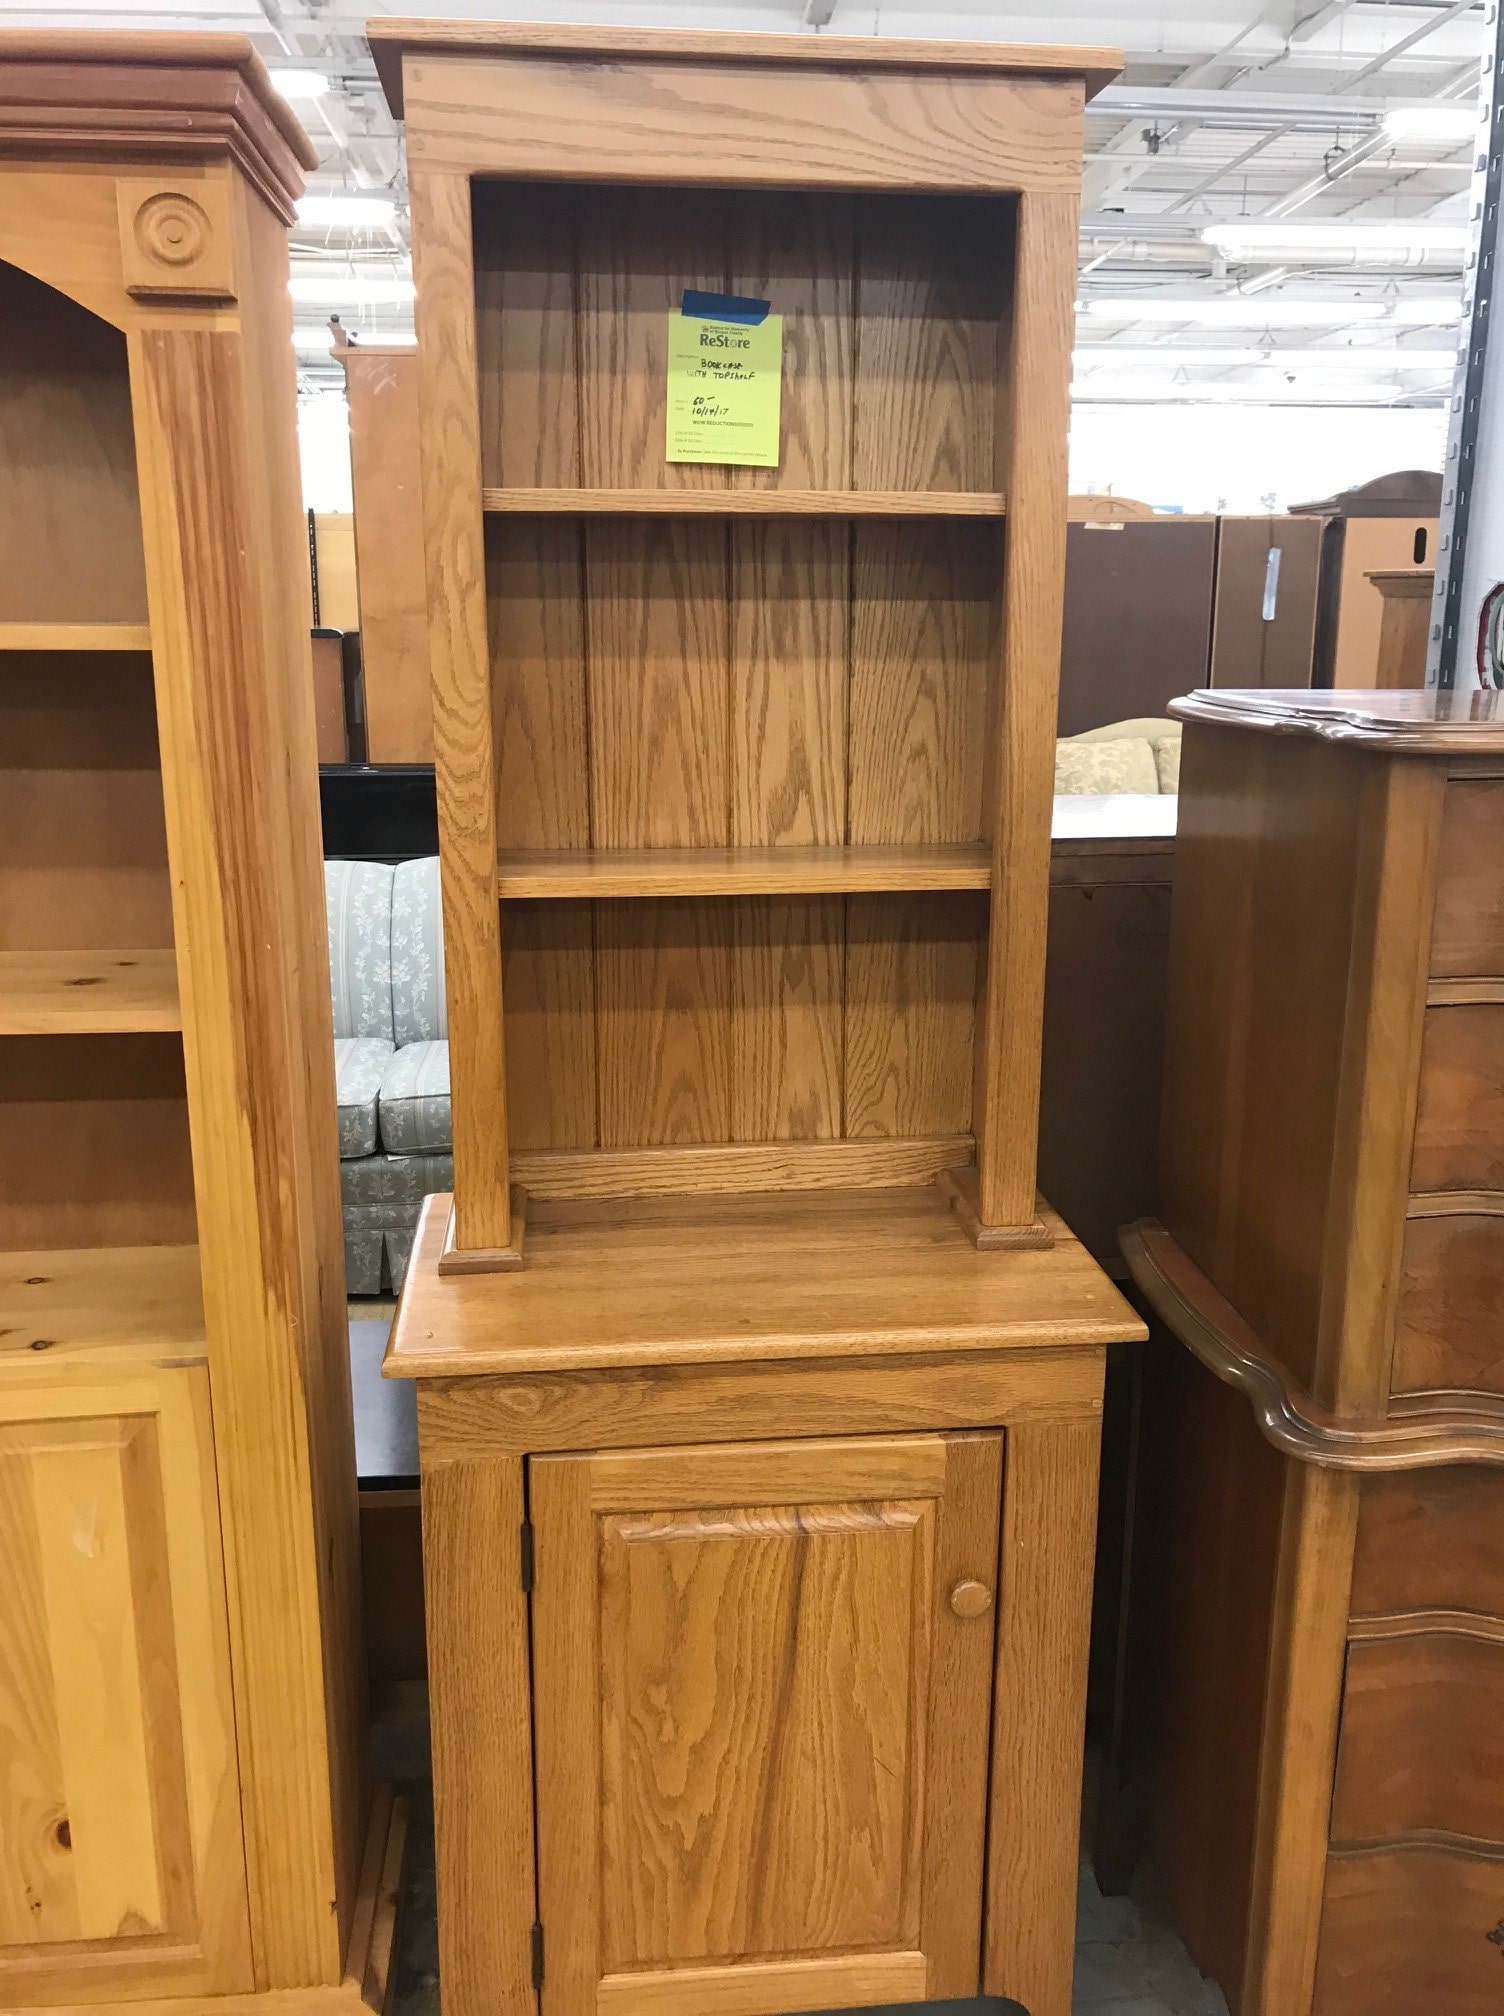 Habitat ReStore Bergen NJ - Furniture for Sale in NJ (12)-min.jpg